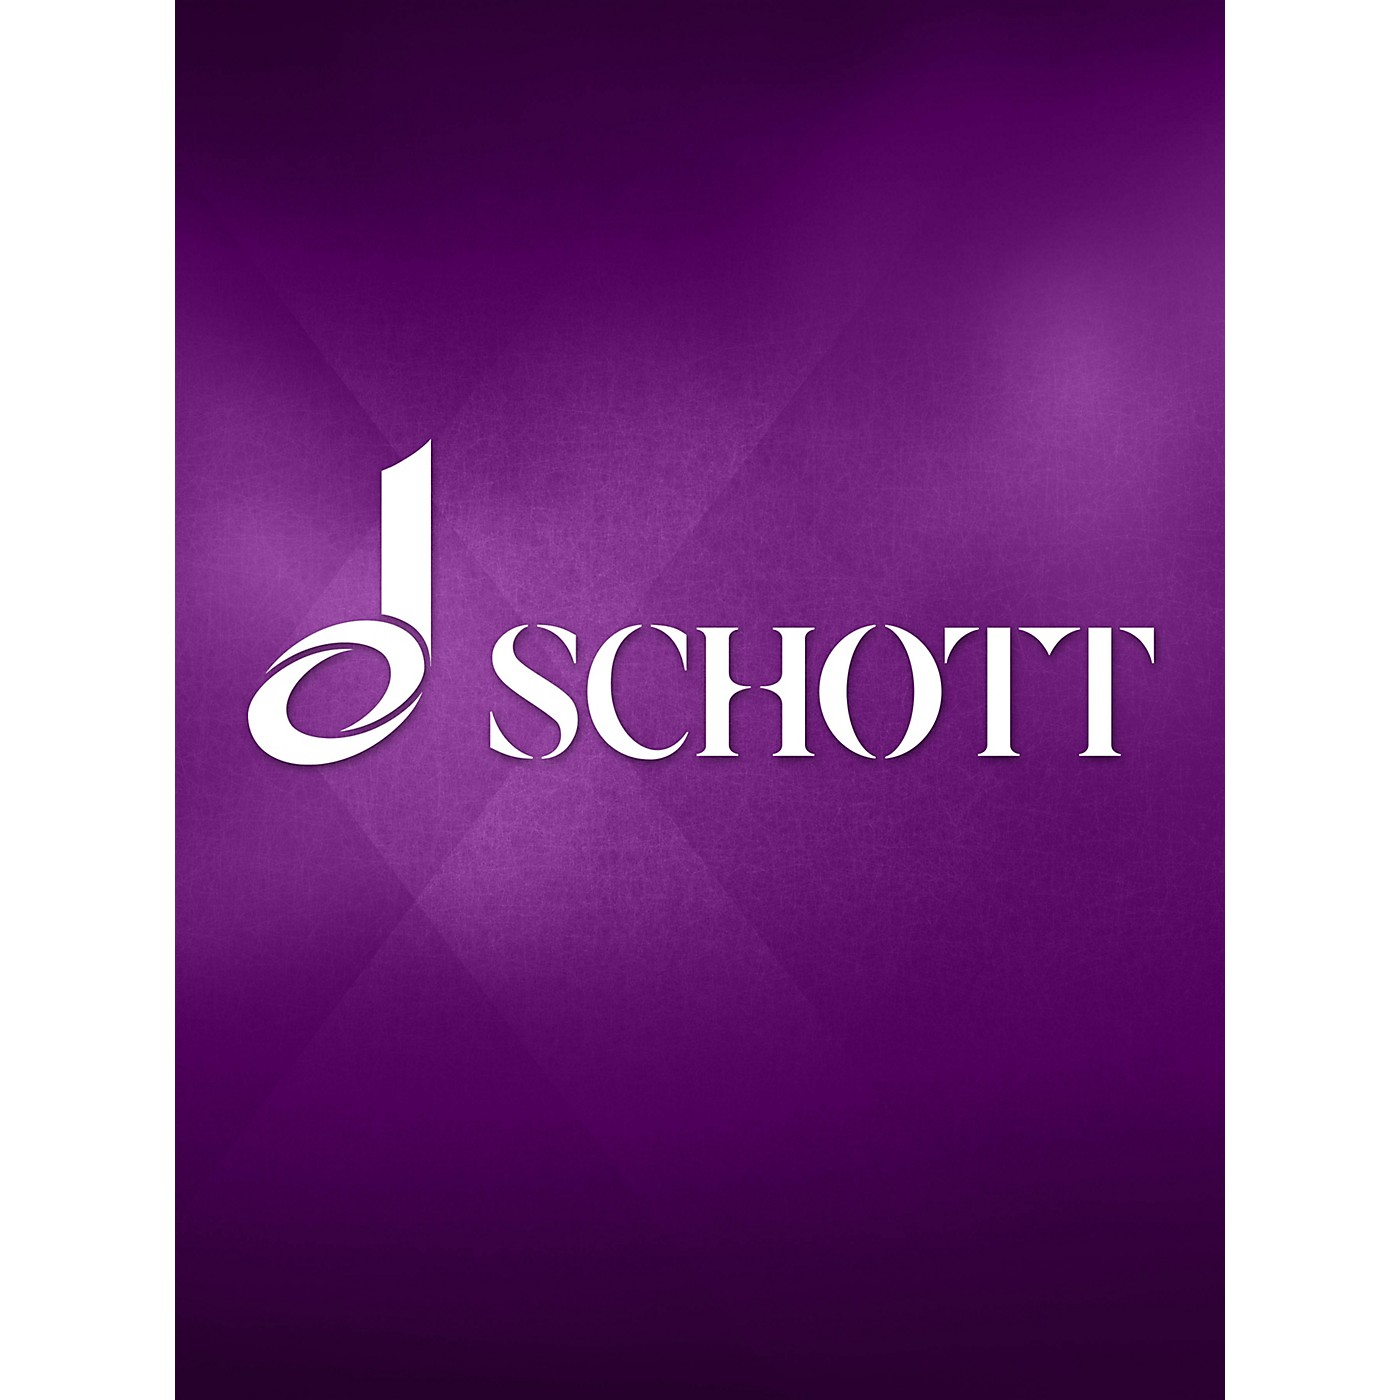 Schott For Four Hands (Piano Duet) Piano Series thumbnail